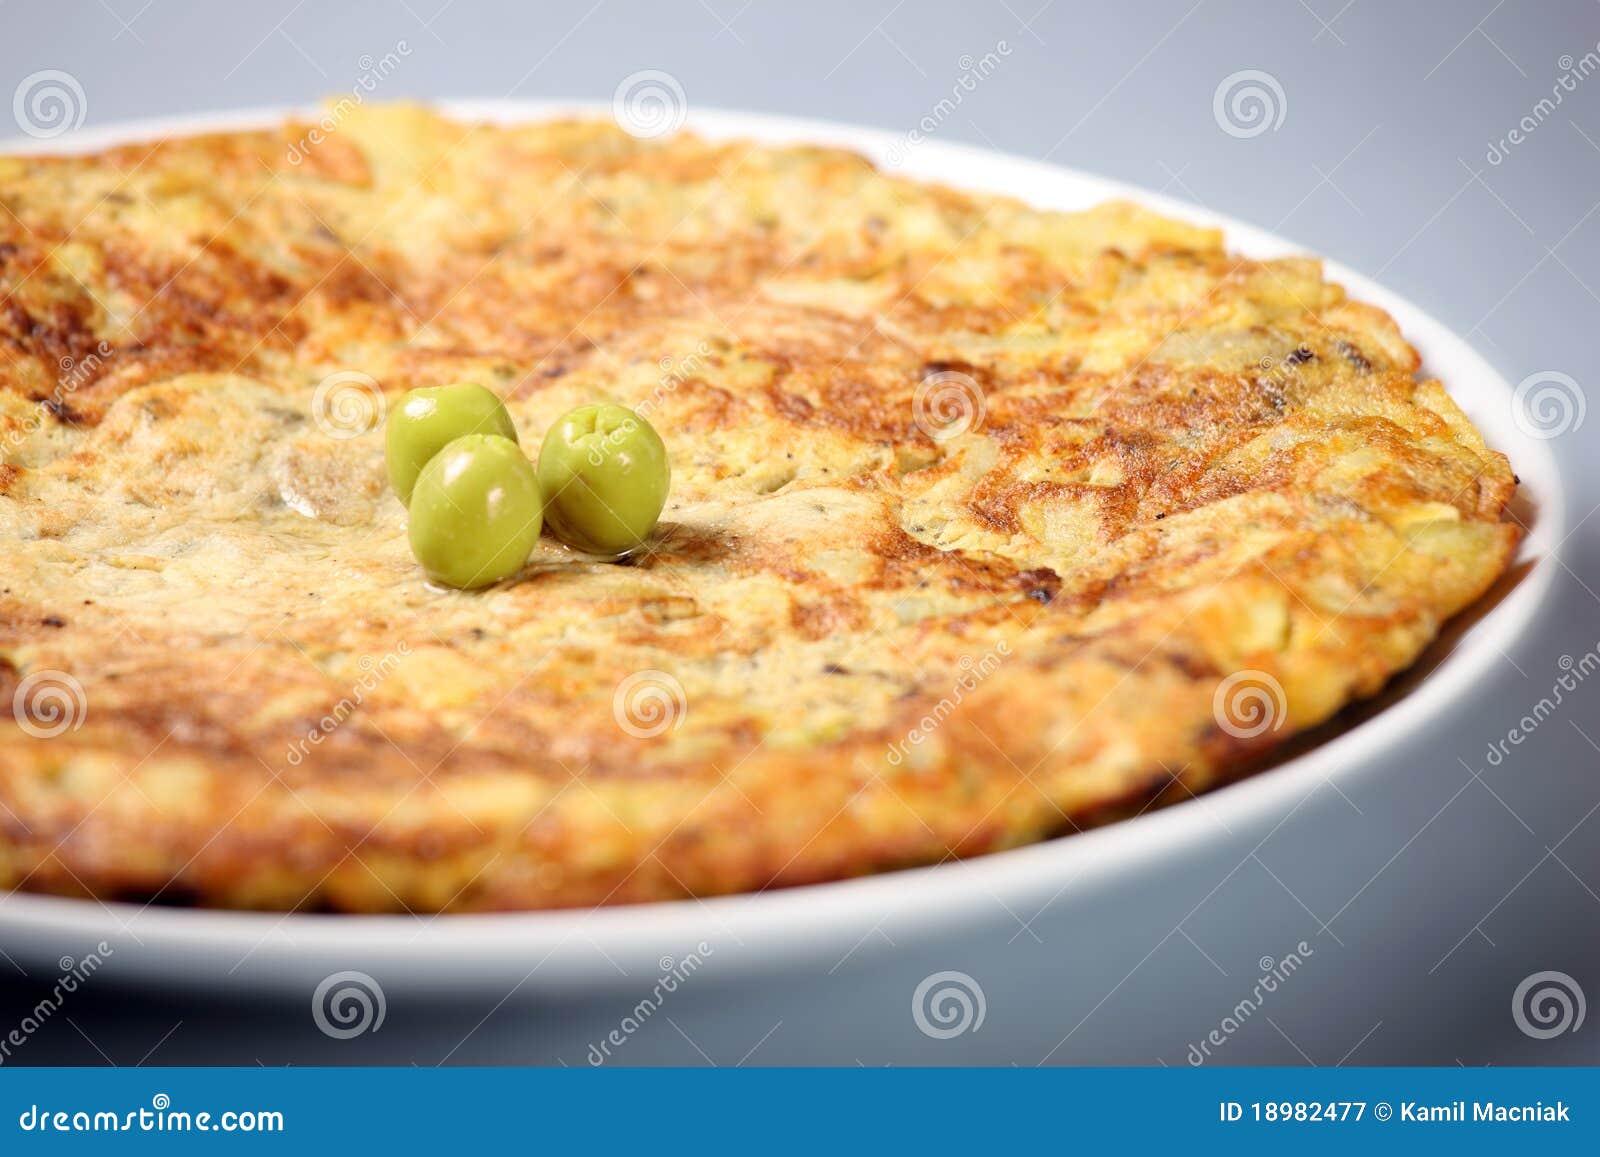 Spanish Tortilla Royalty Free Stock Photography - Image: 18982477